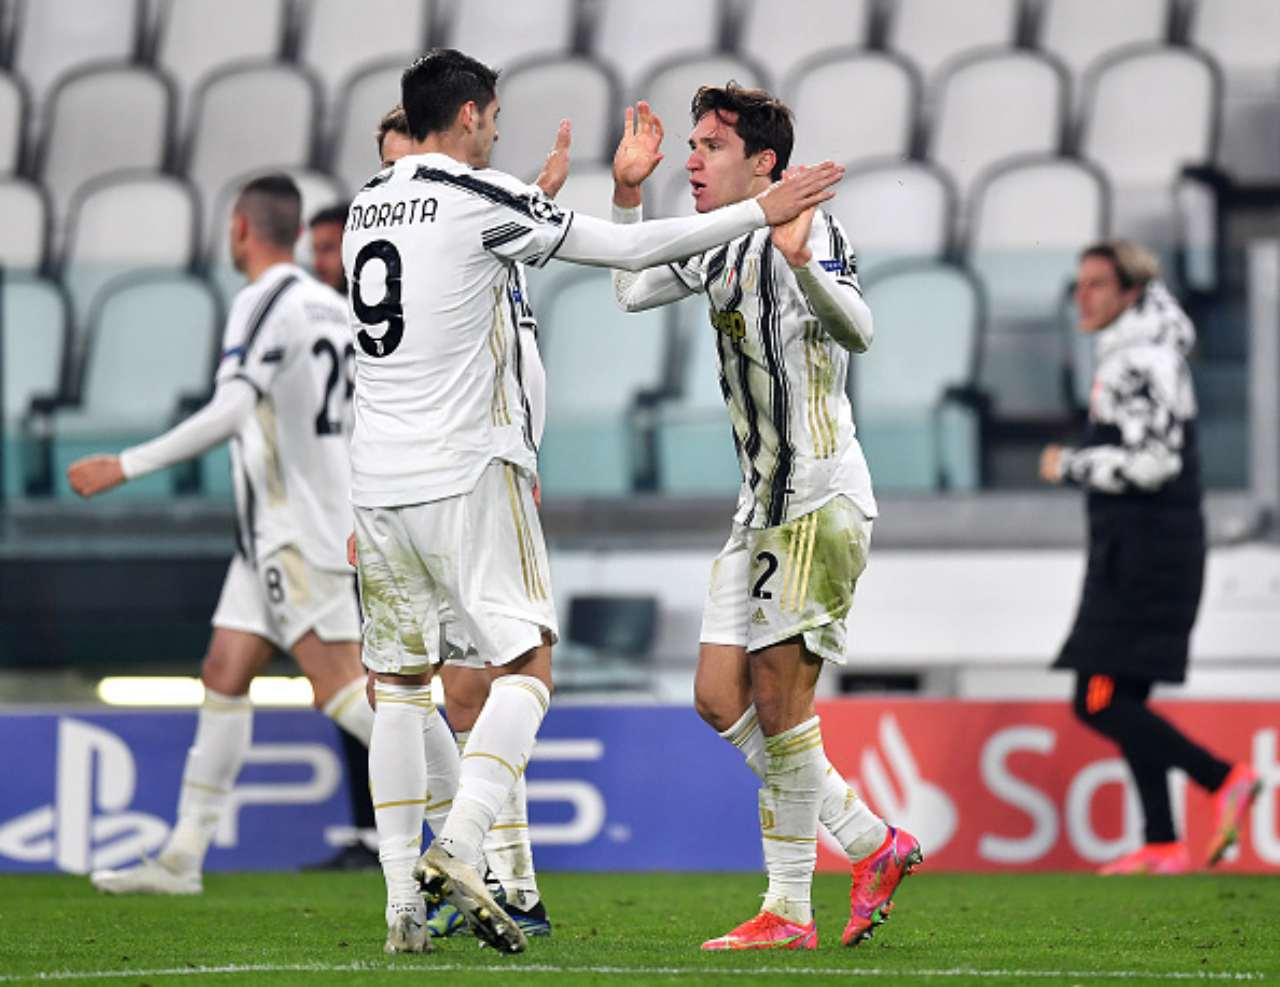 Morata calciomercato Juventus